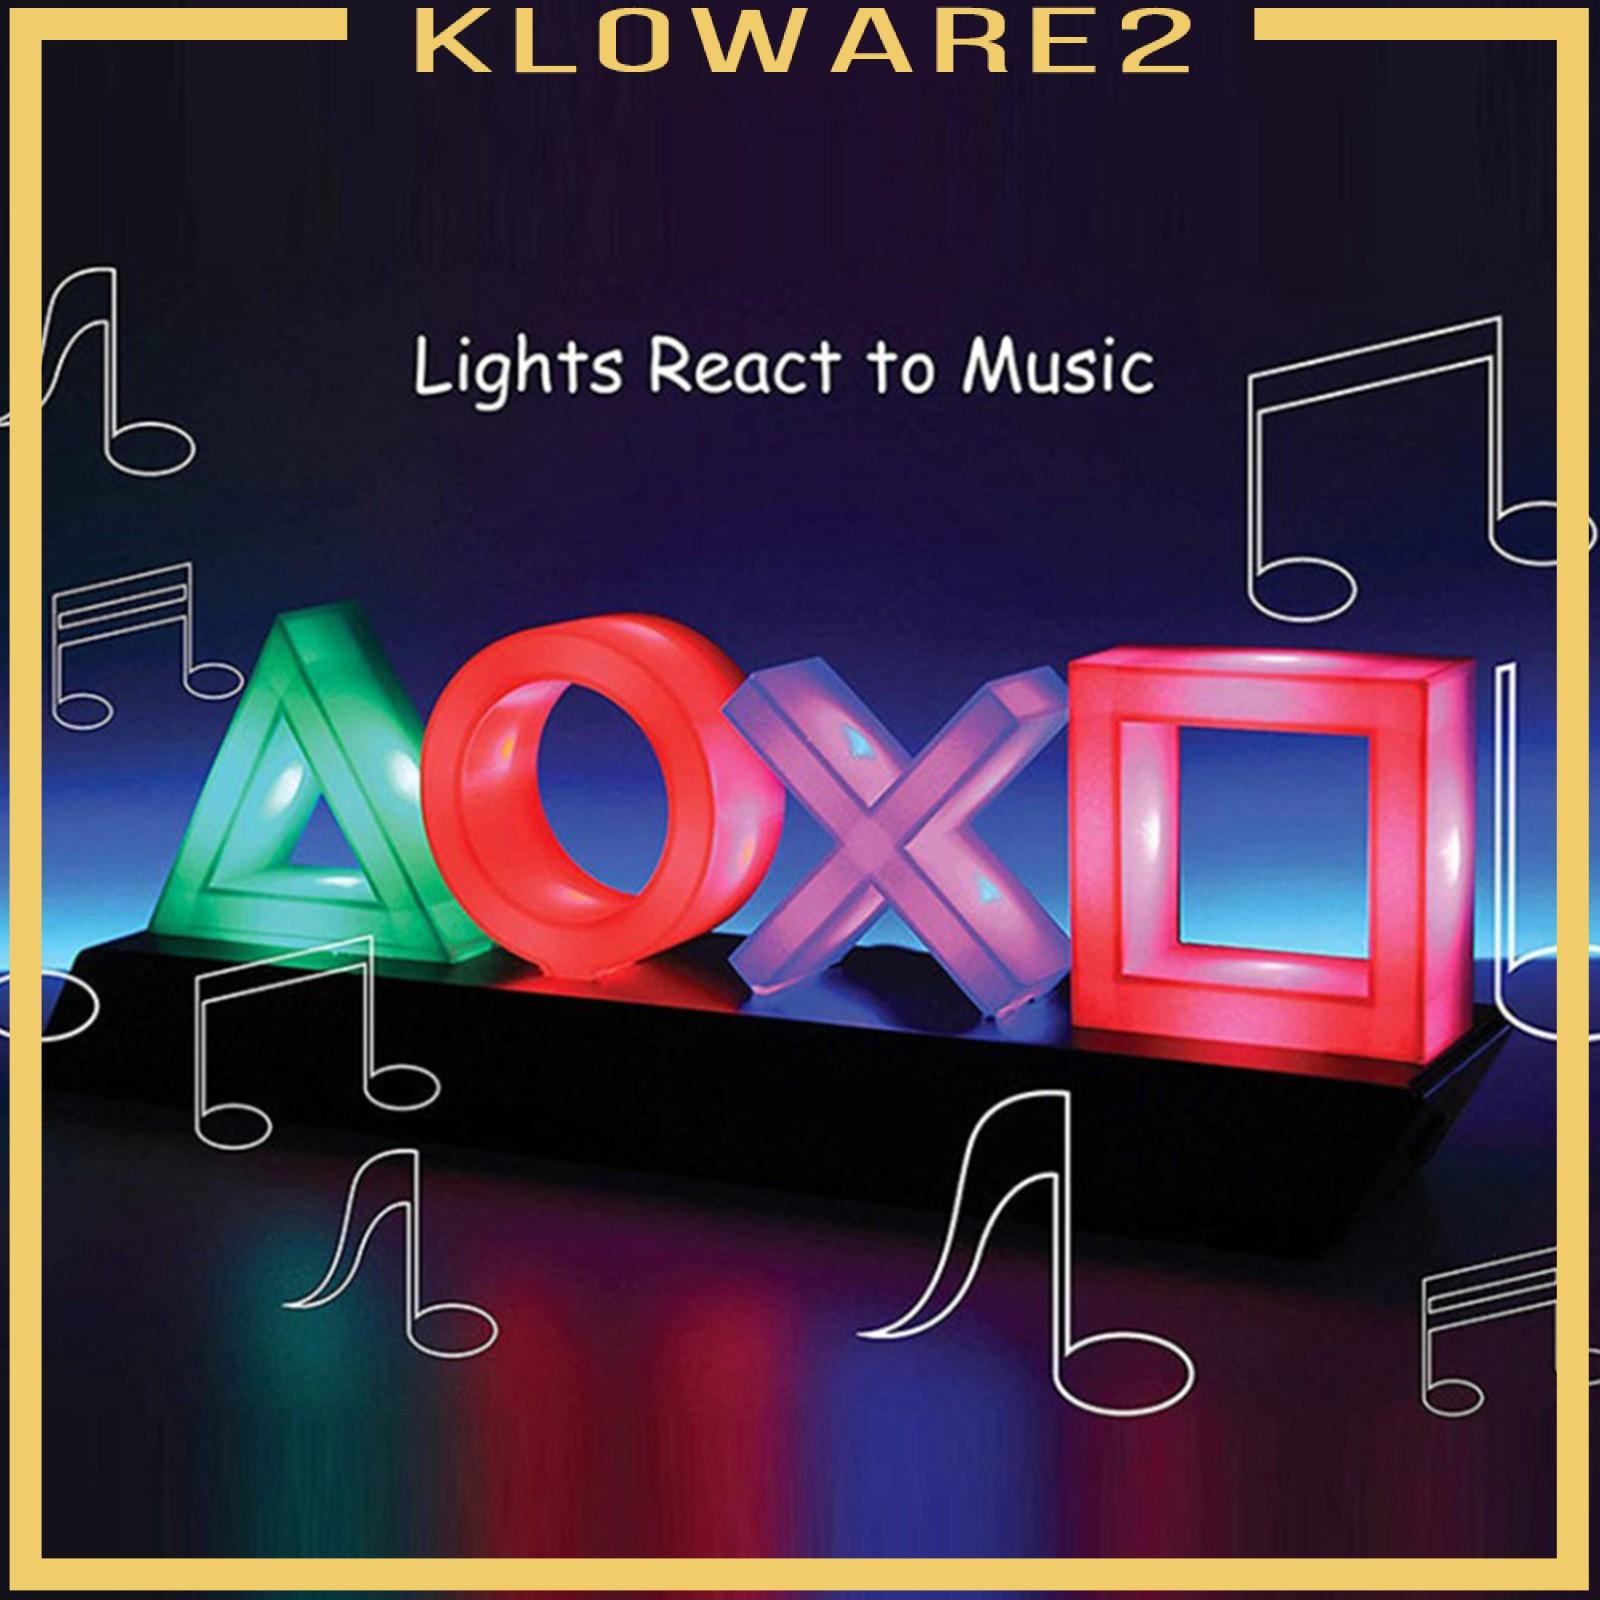 [Kloware2] Game Icons Light Lamp for Gamer Playstation 遊戲室家居